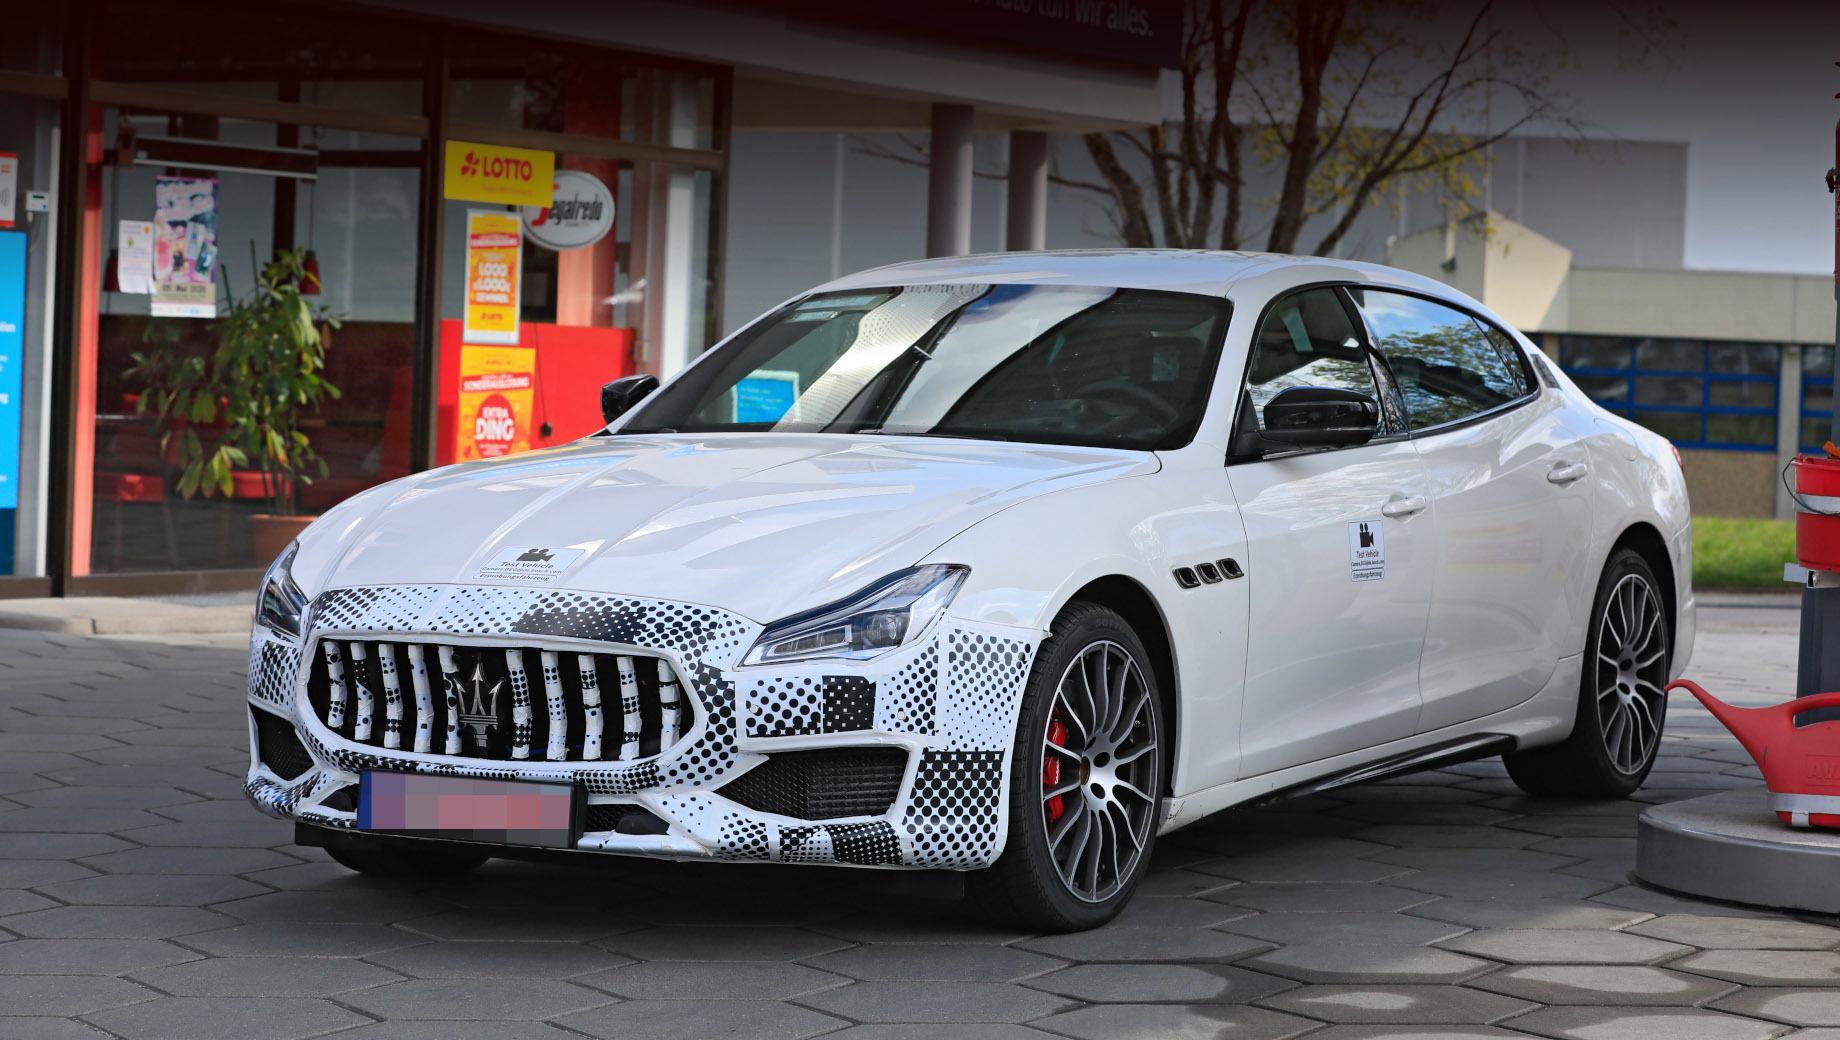 Прототип Maserati Quattroporte 2021 года вышел на тесты